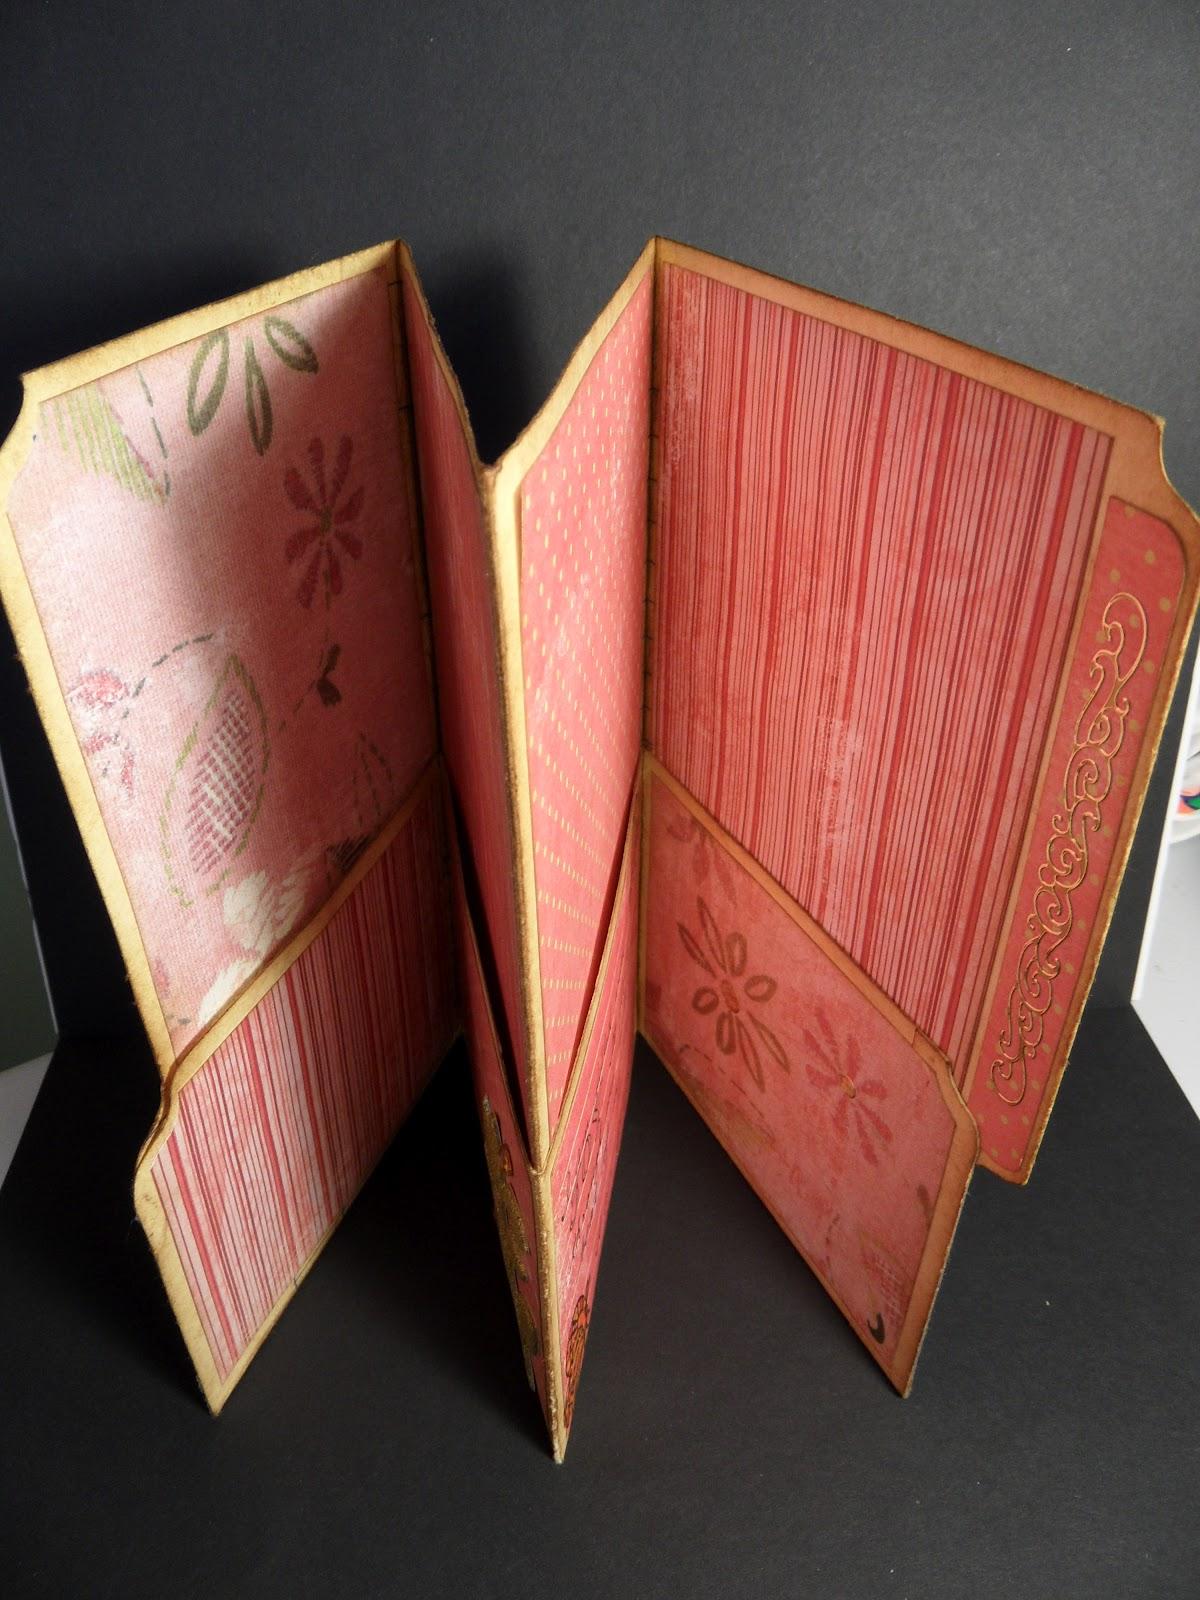 Trish S Artistic Adventures File Folder Journal Positive Affirmations